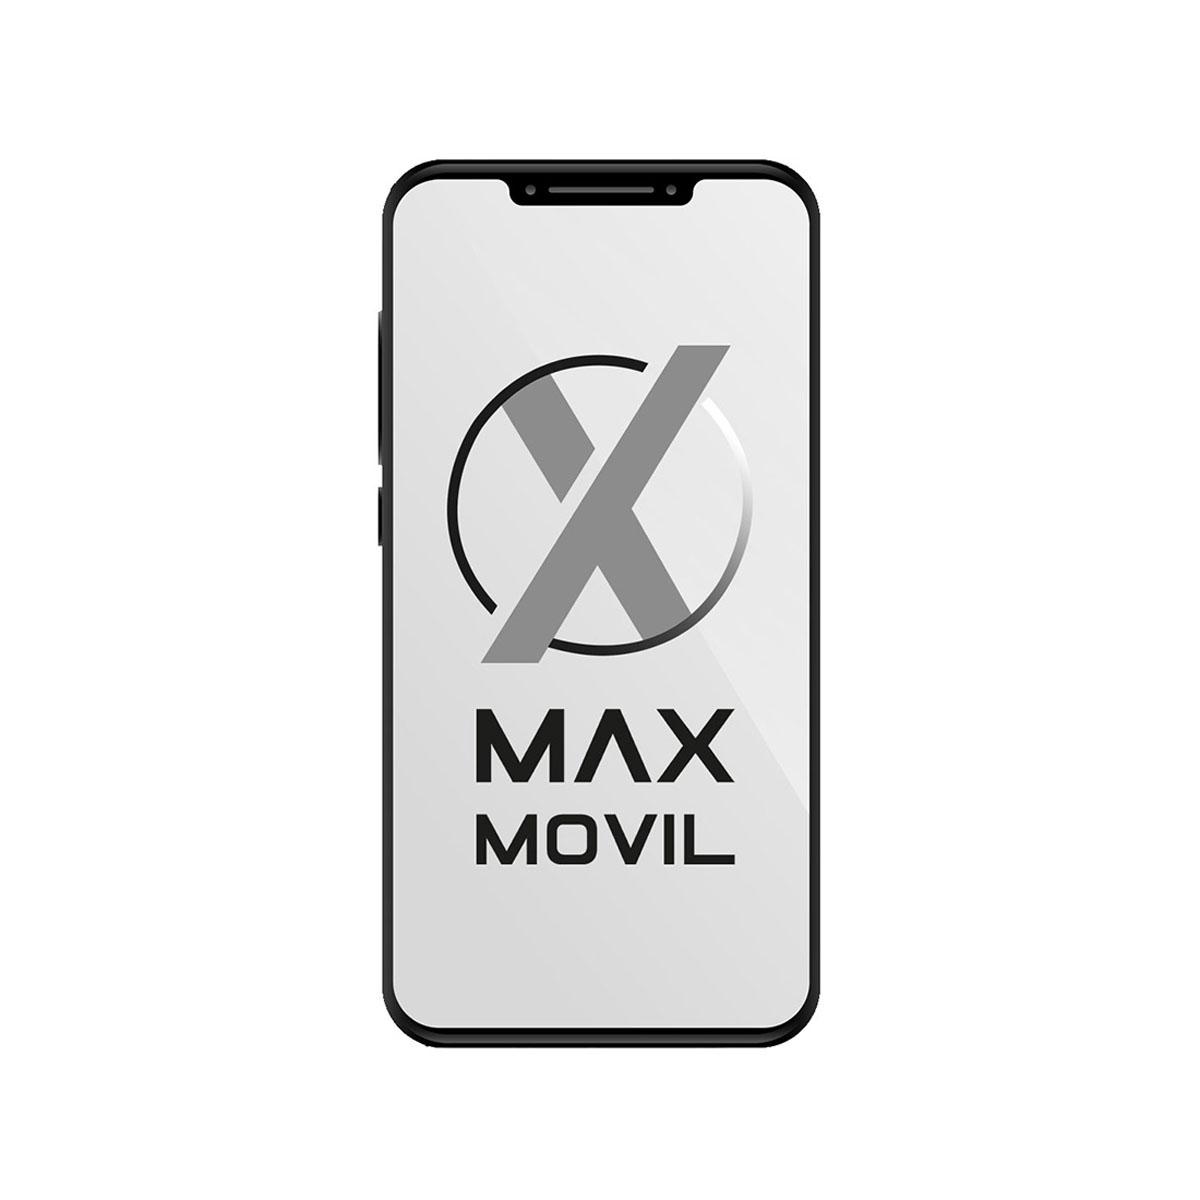 Funda Smart Cover para iPad mini 4 Gris MKLV2ZM/A